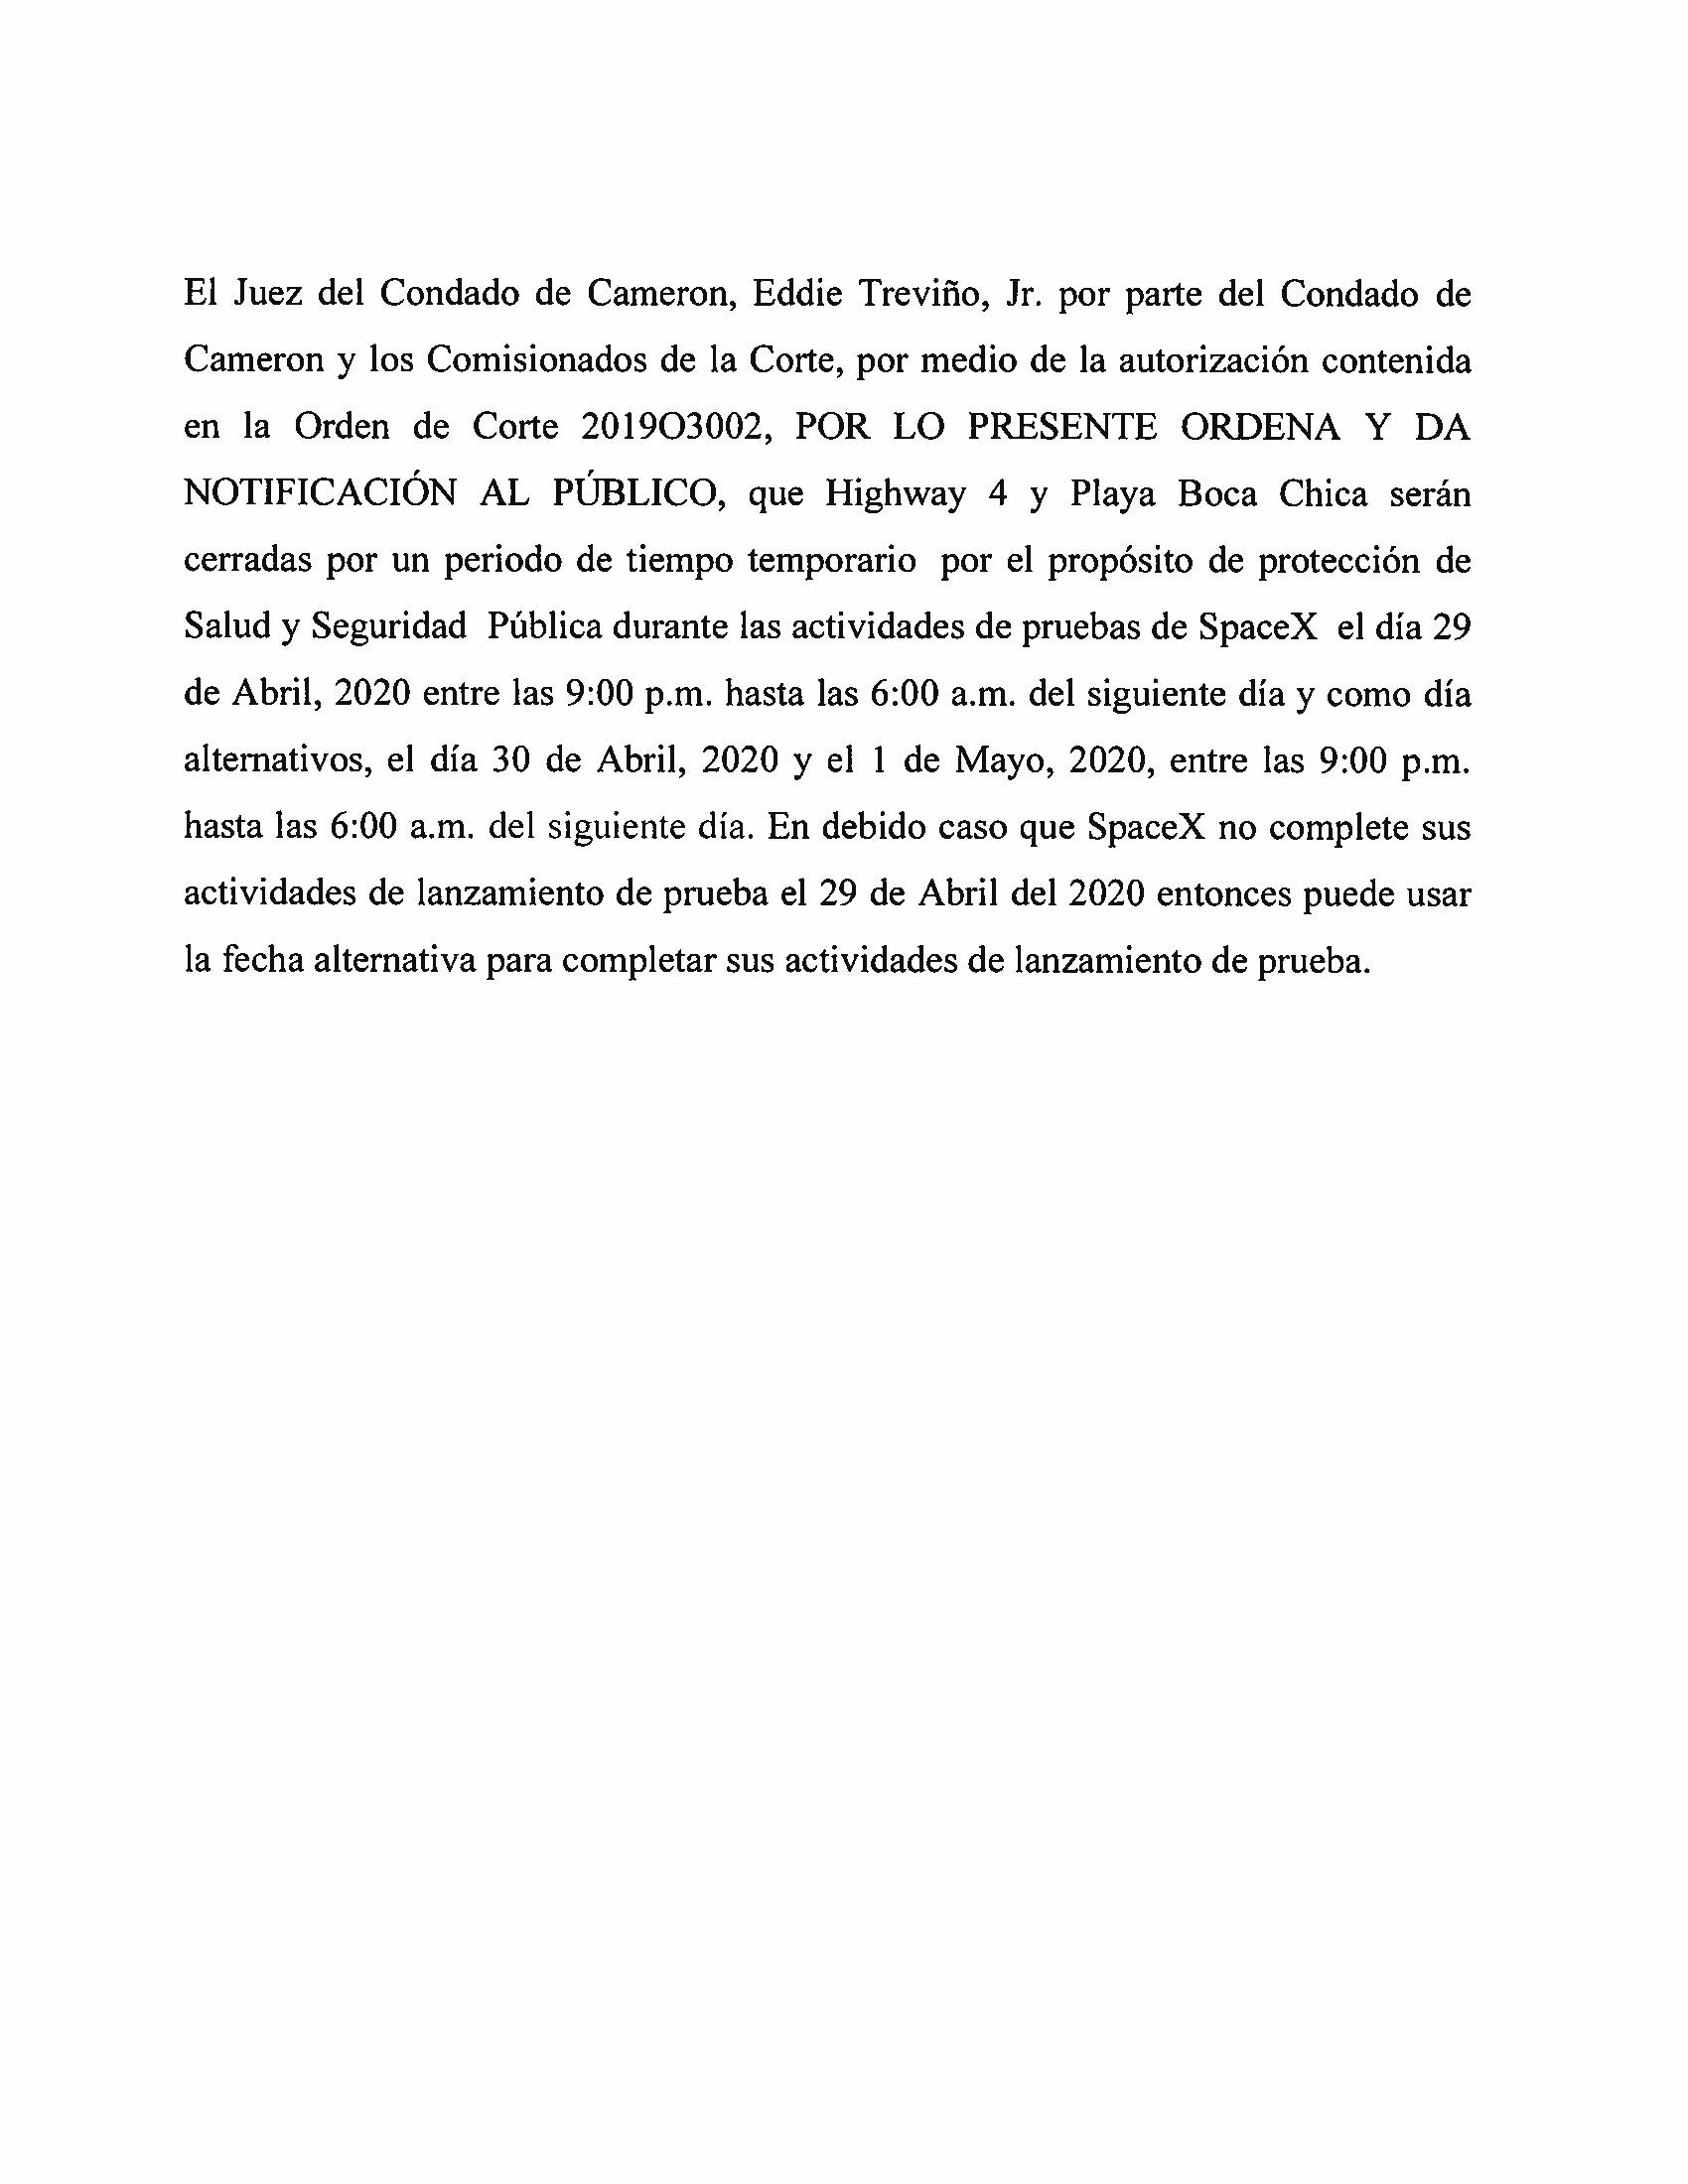 ORDER.CLOSURE OF HIGHWAY 4 Y LA PLAYA BOCA CHICA.SPANISH.04.29.20